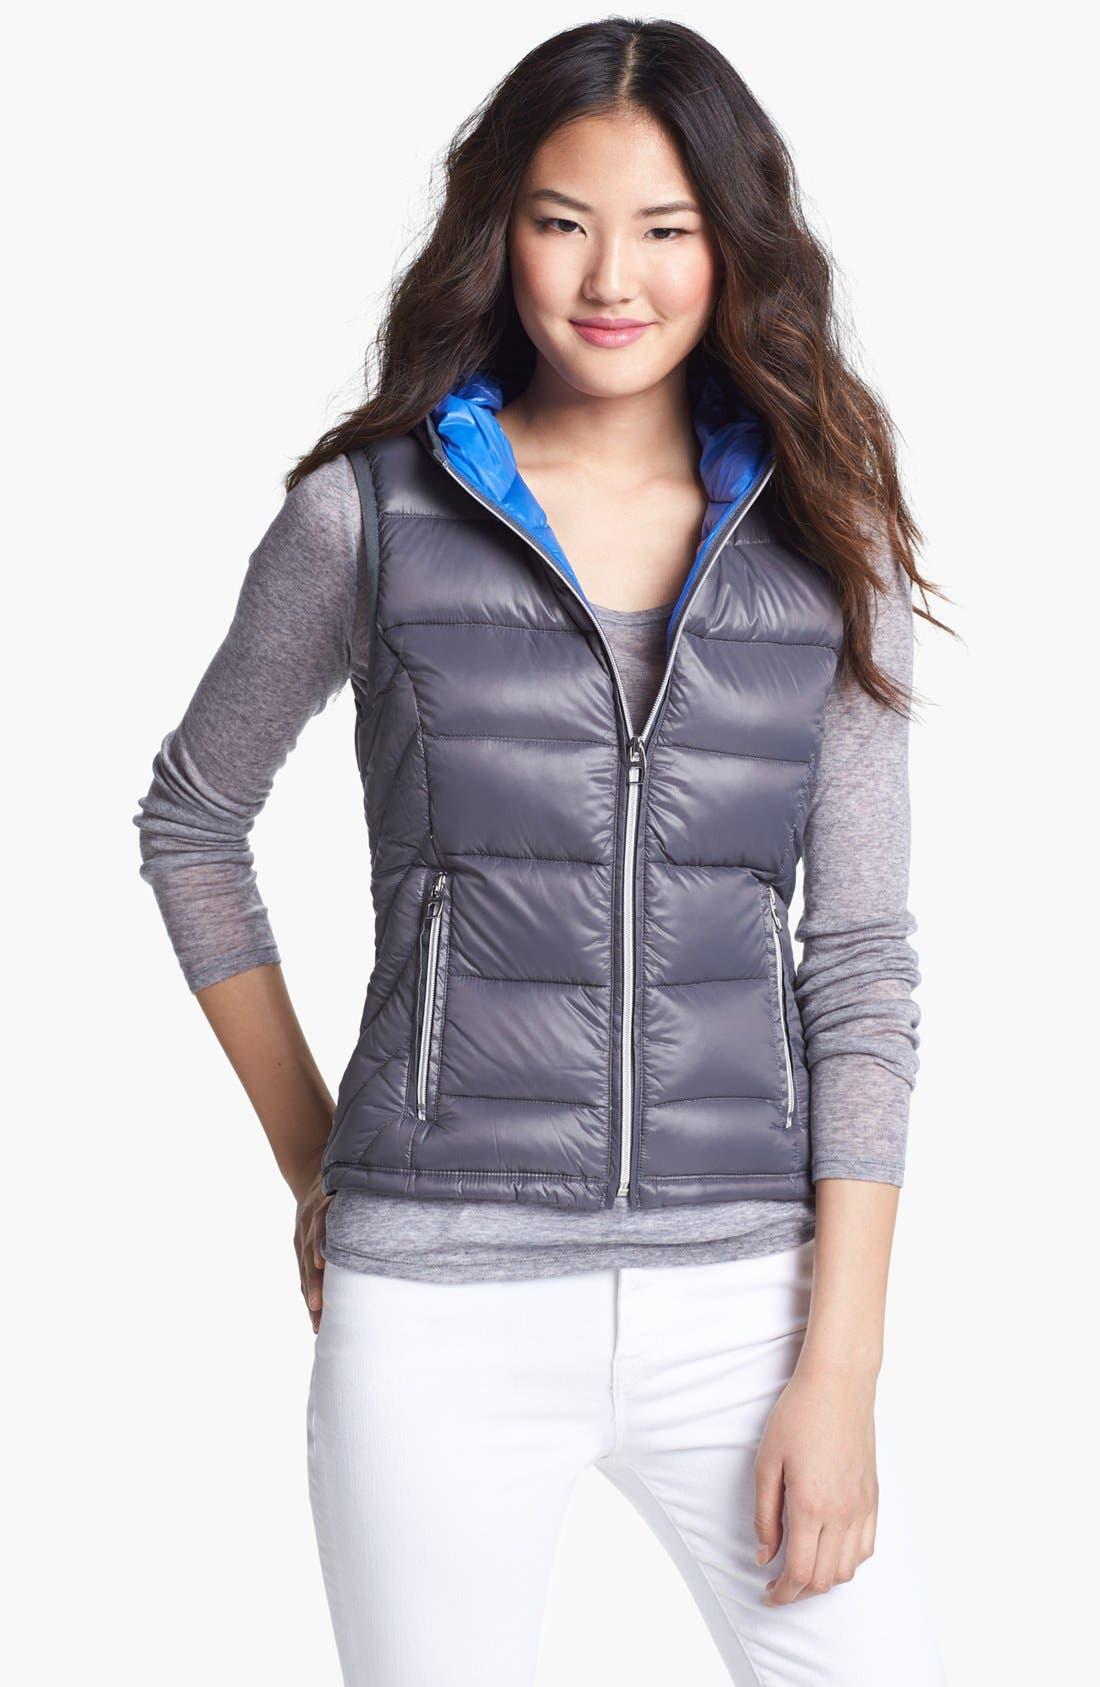 Alternate Image 1 Selected - London Fog Hooded Packable Down Vest (Online Only)